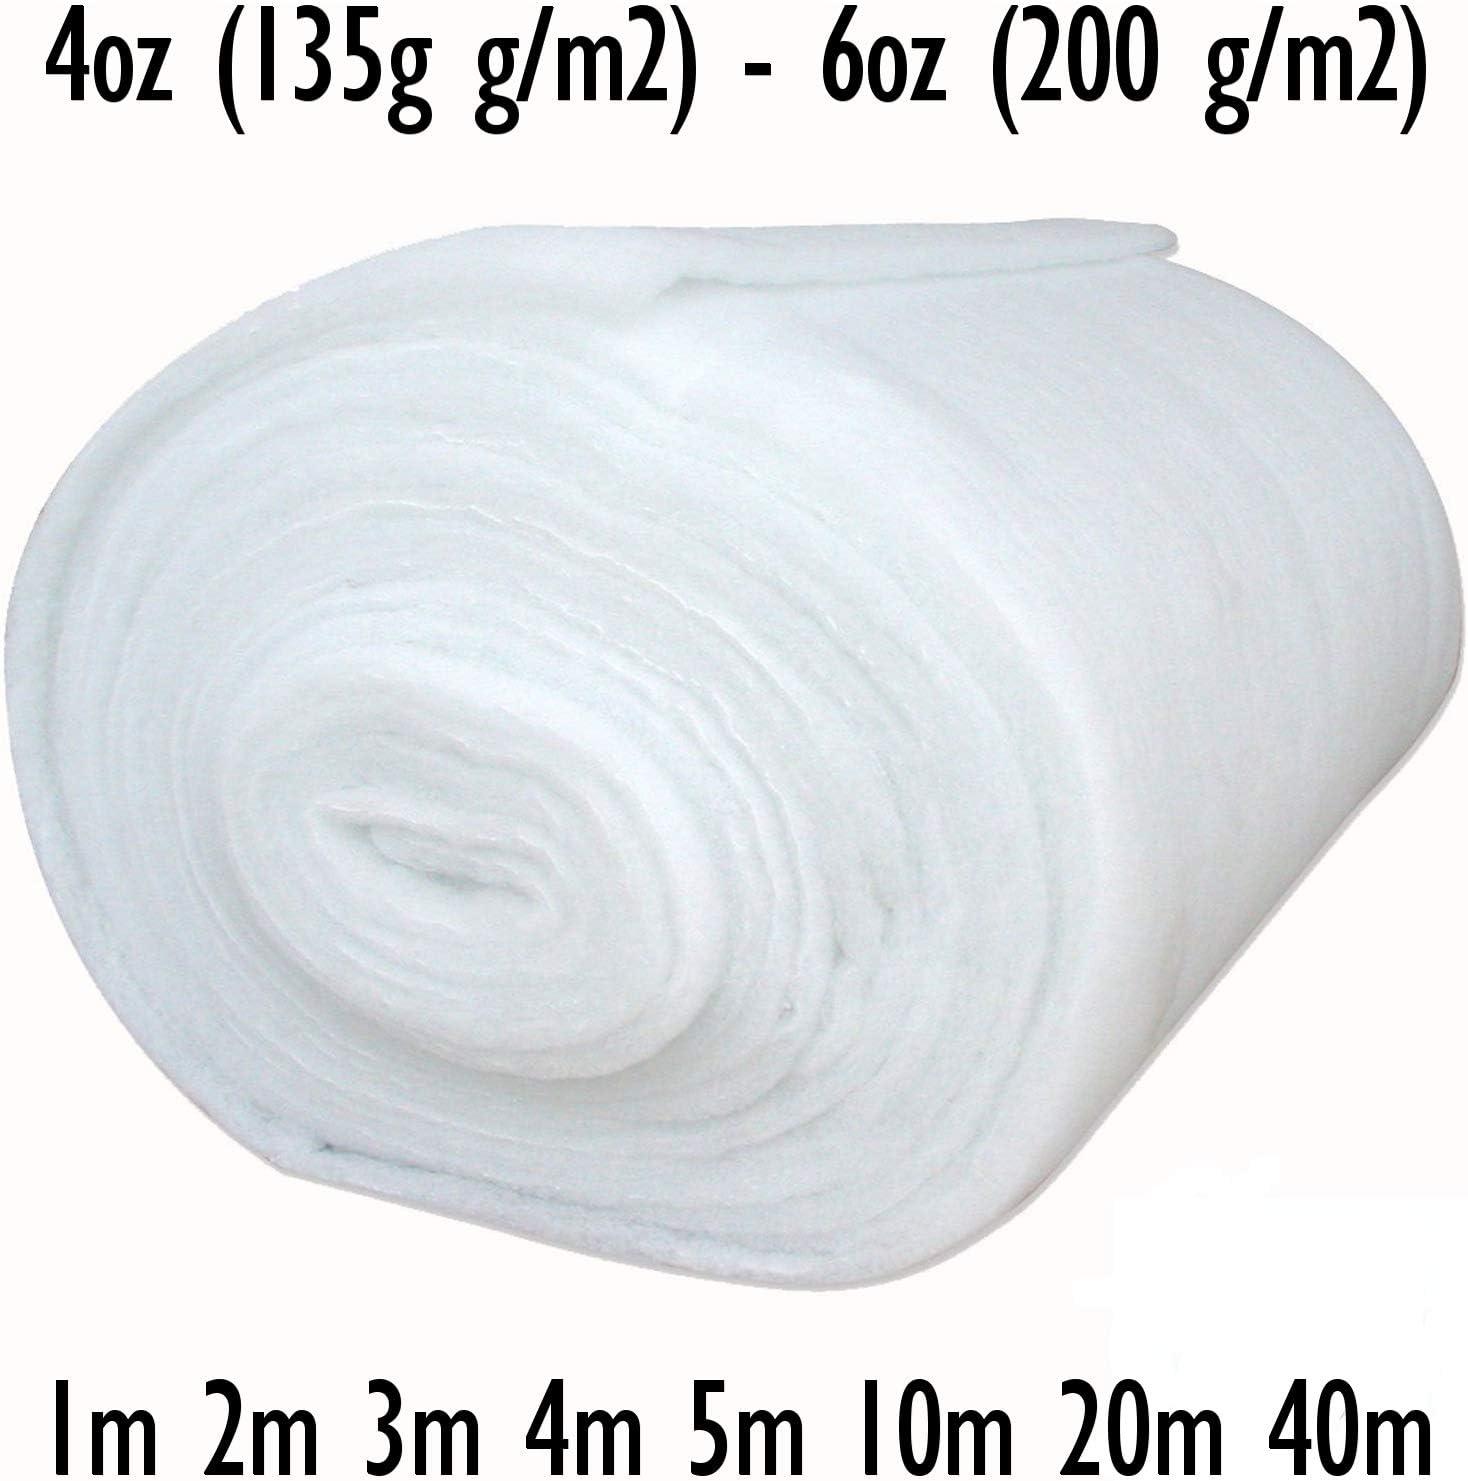 27 inch 4oz Polyester Quilting Wadding Upholstery Dacron.Batting Flame Retardant